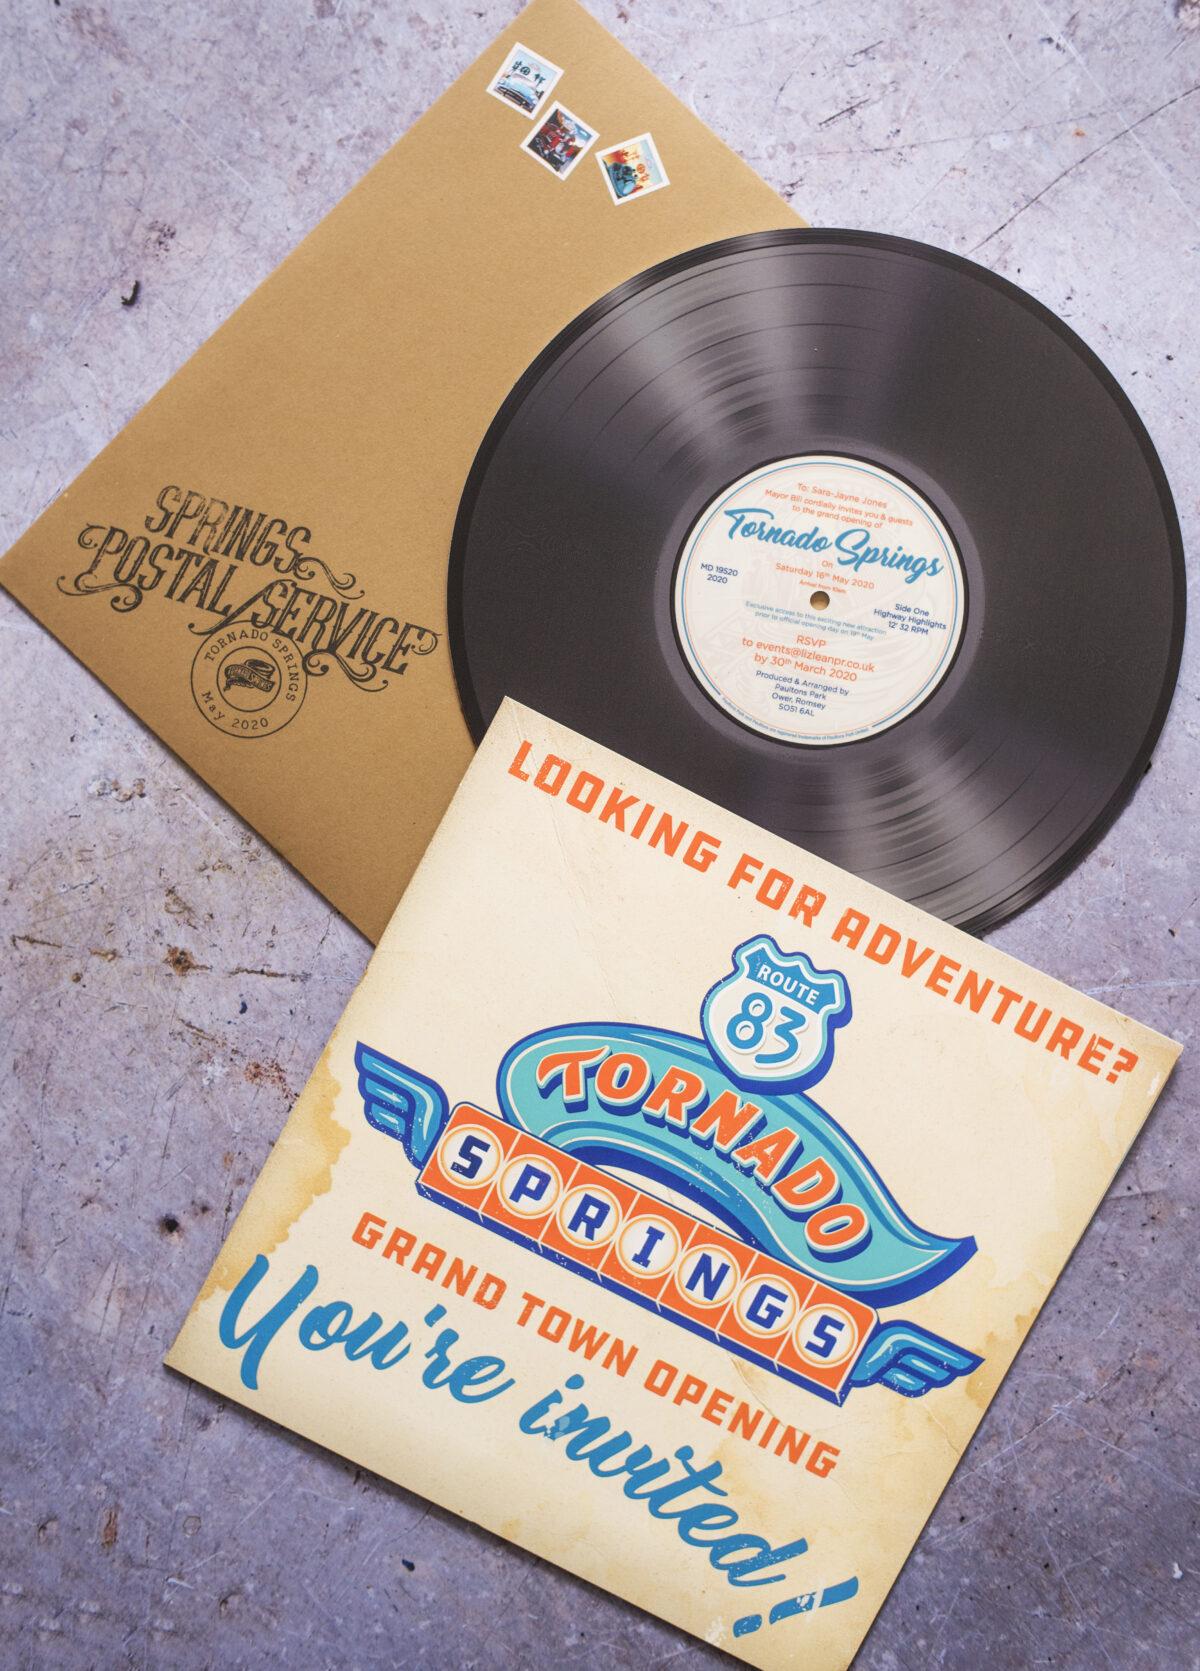 tornado springs paultons park press invite image shows a replica vinyl record advertising the new area of the theme park